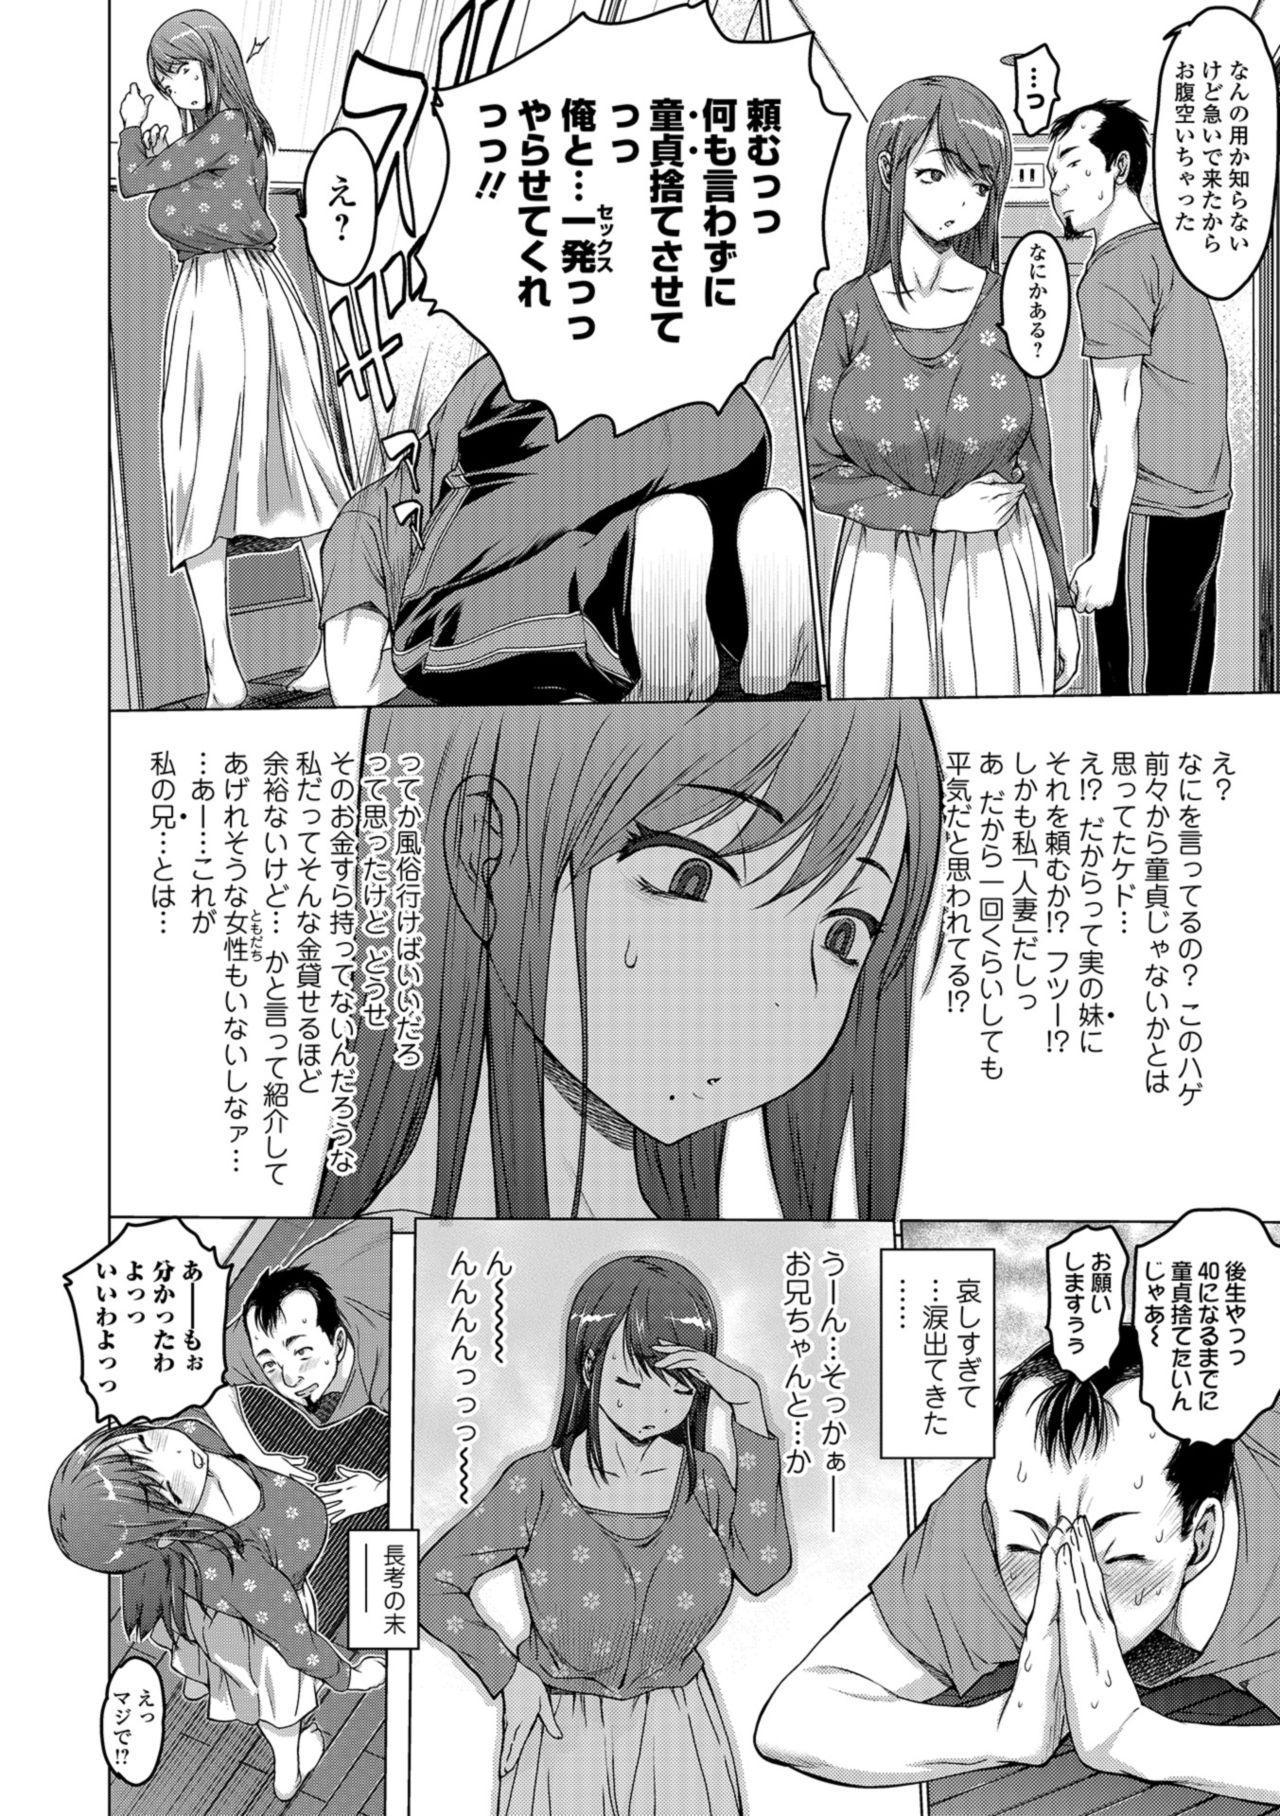 COMIC Shigekiteki SQUIRT!! Vol. 09 21